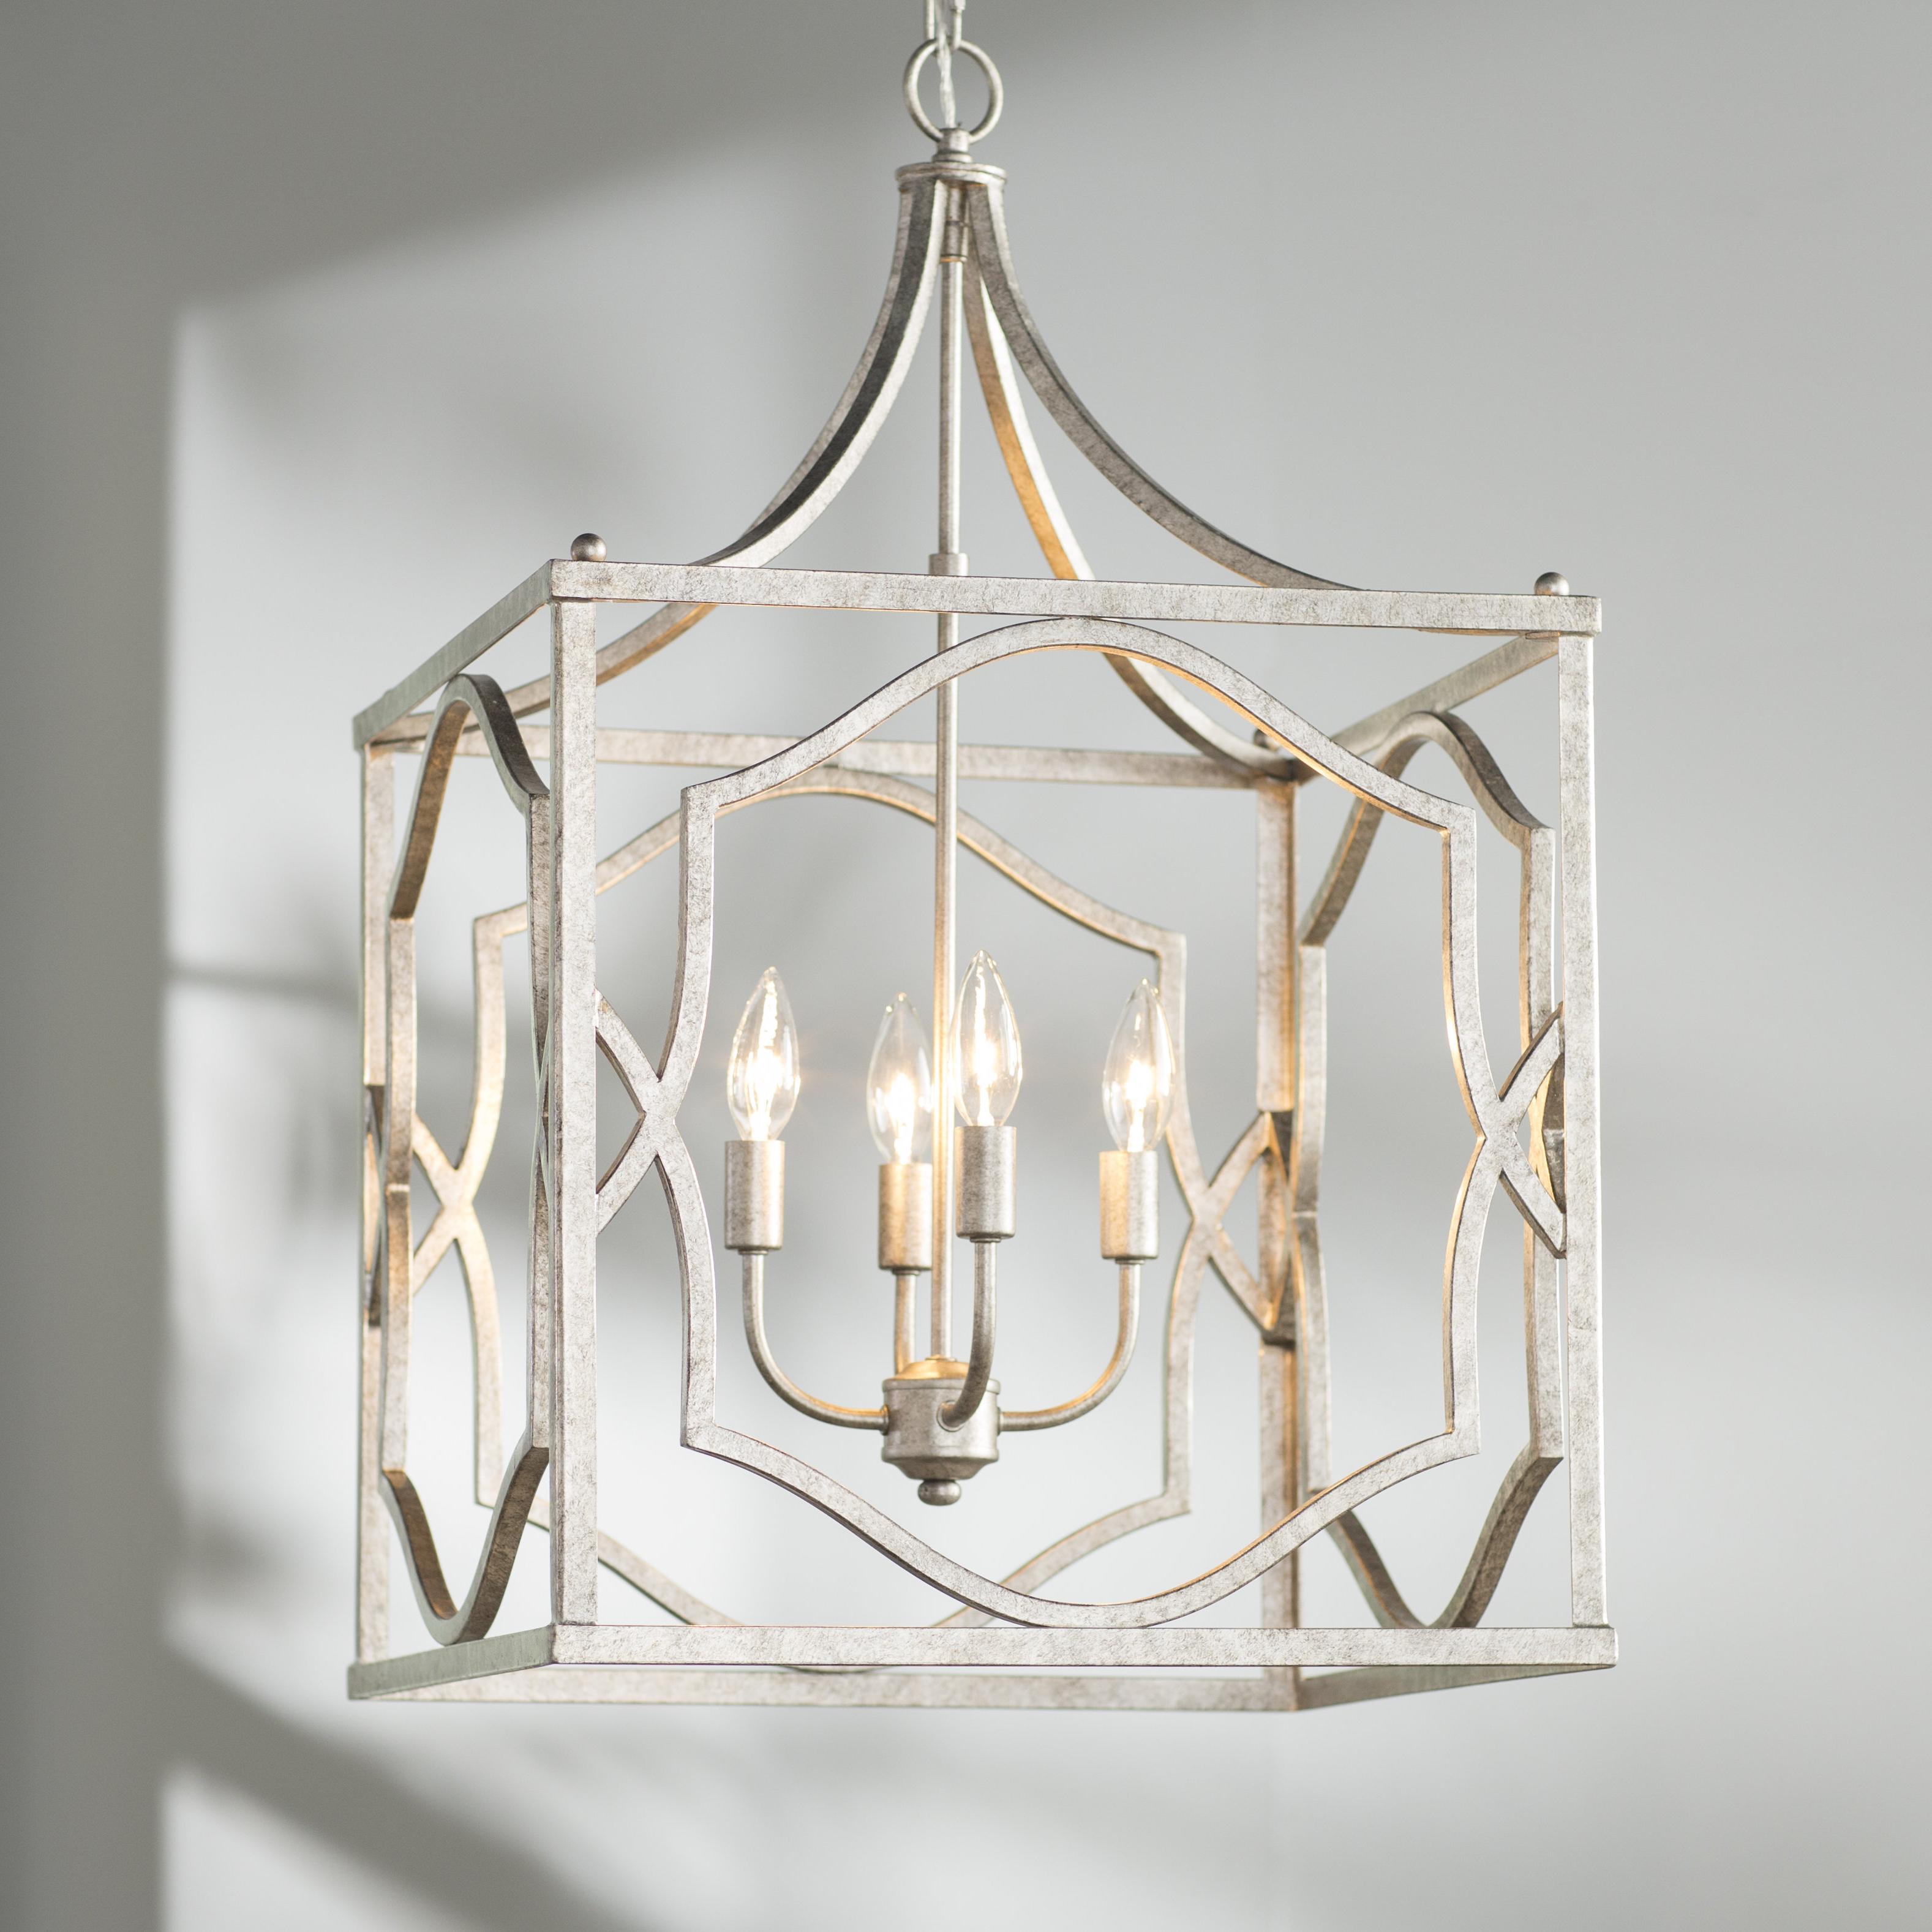 2019 Destrey 3 Light Lantern Square/rectangle Pendants Throughout Destrey 4 Light Lantern Square / Rectangle Pendant (Gallery 2 of 20)